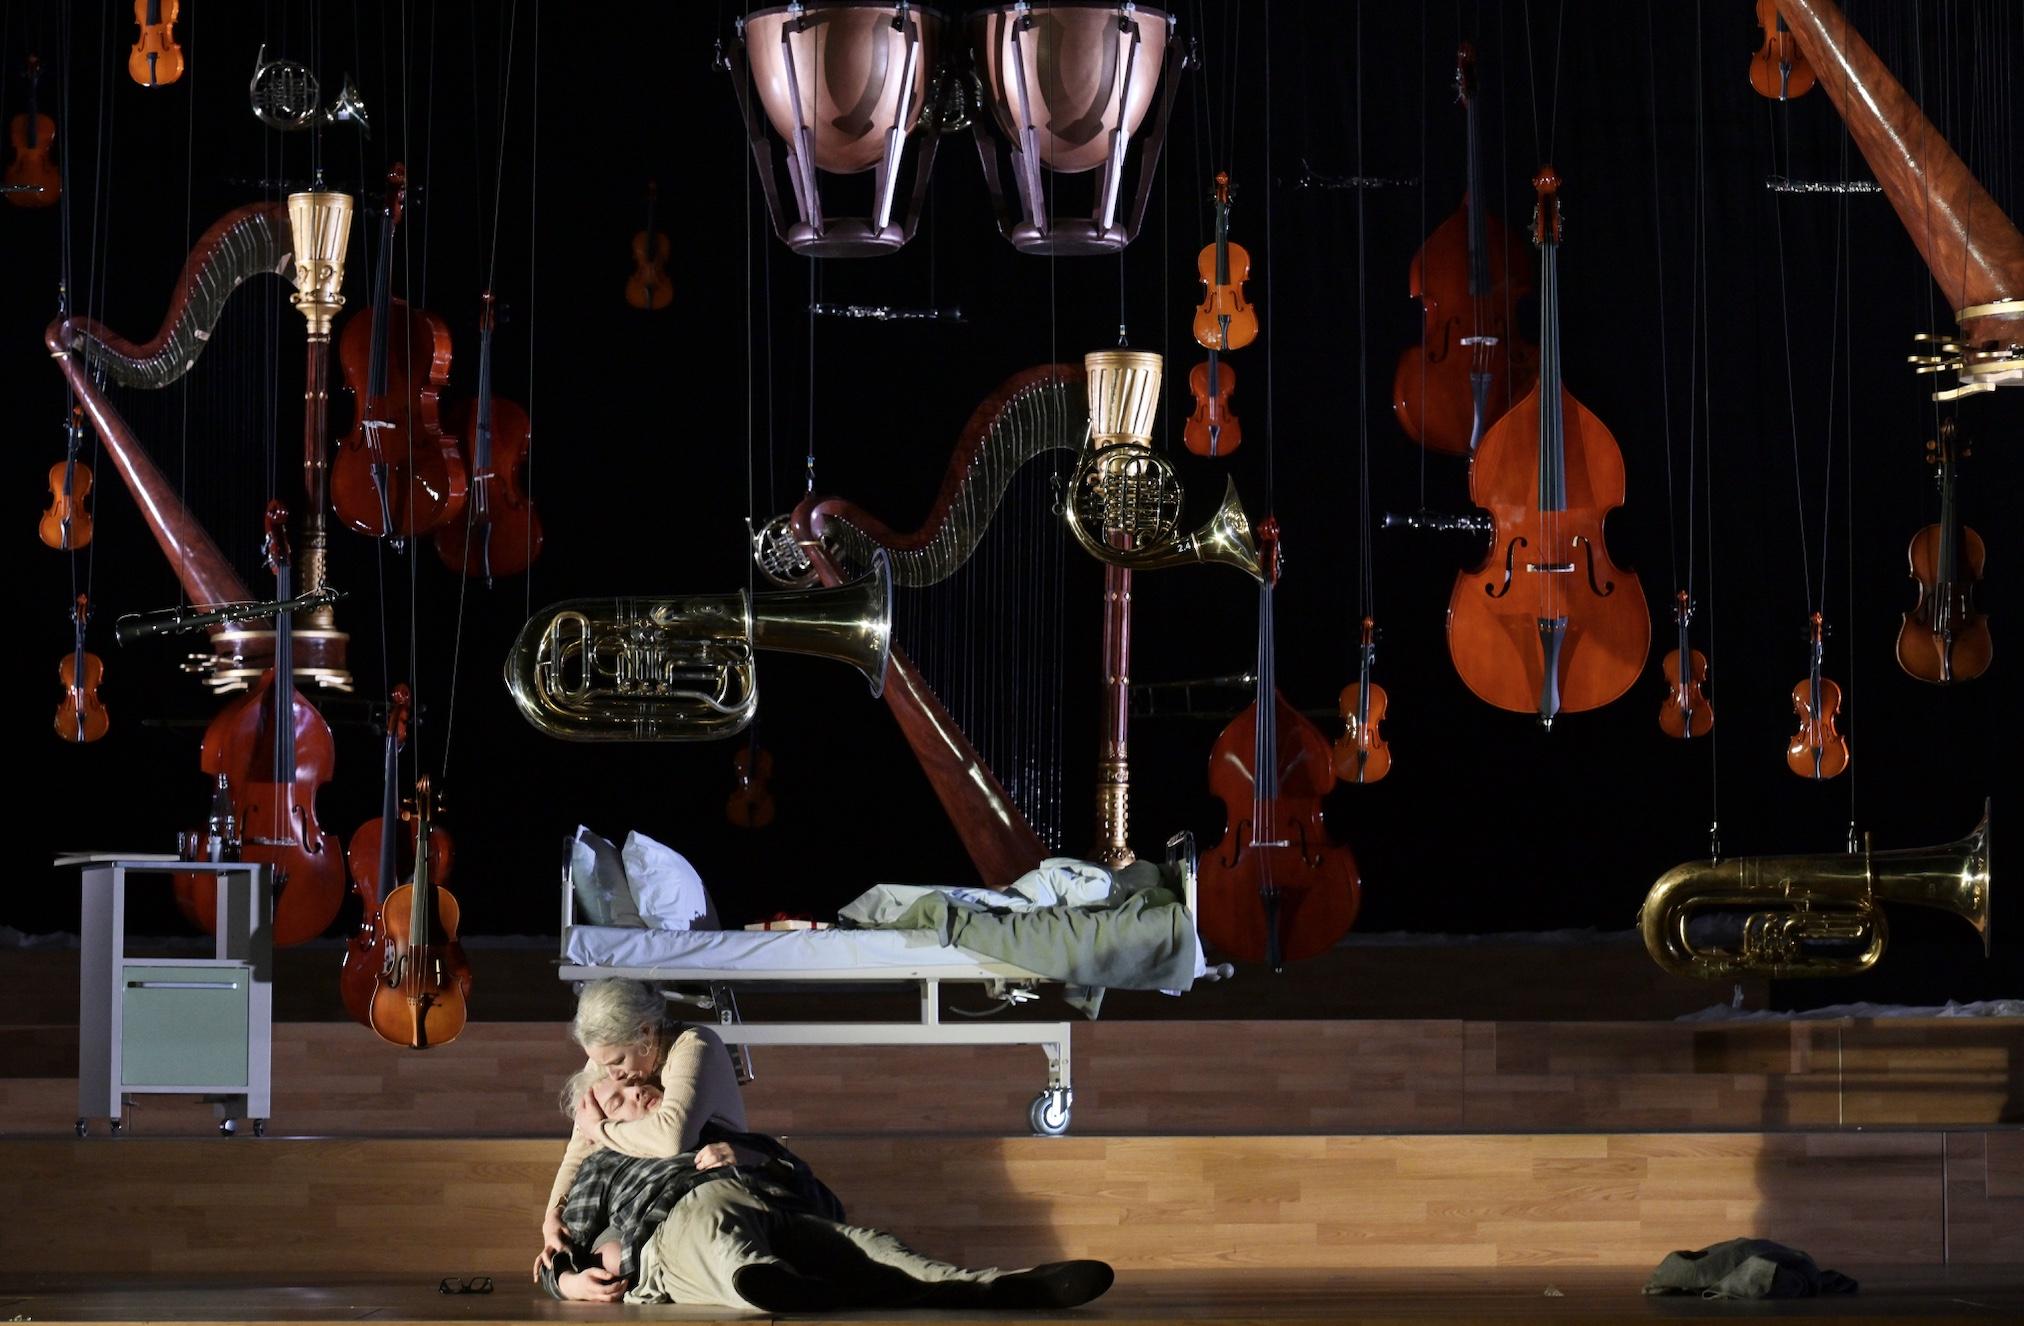 Der ferne Klang, Damiano Michieletto; Paolo Fantin; Oper Frankfurt; Opera; Franz Schreker; Jennifer Holloway; Ian Koziara